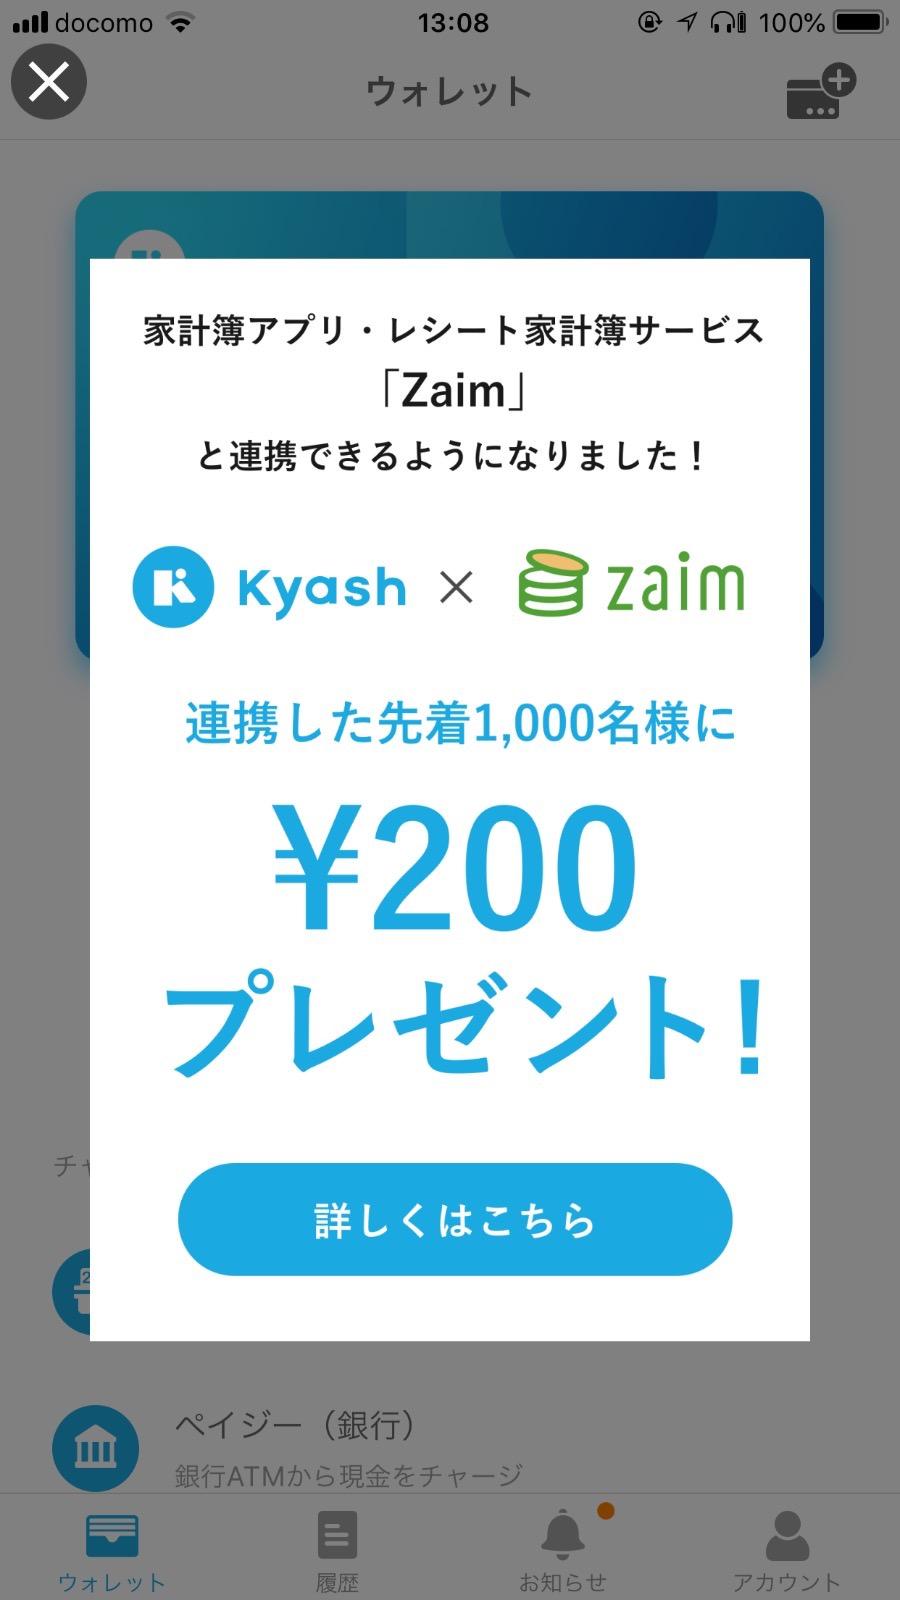 「Kyash」家計簿アプリZaimと連携可能に